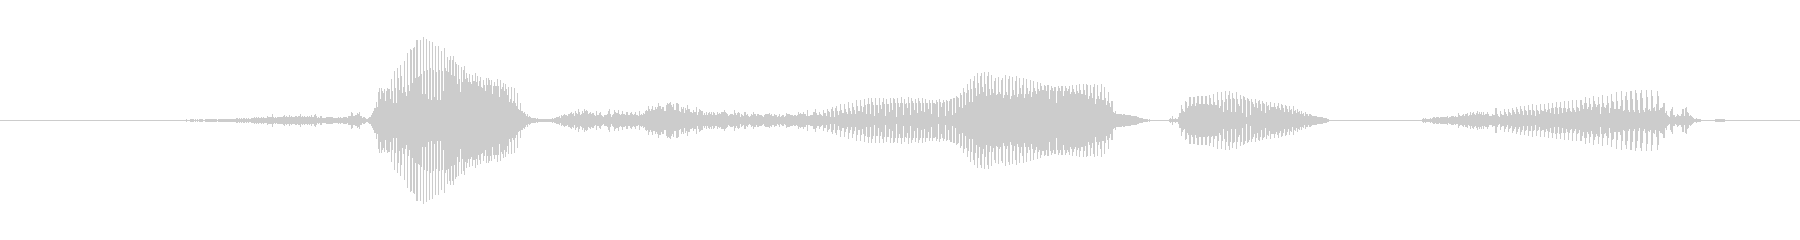 SARS-CoV-2の未再生の波形